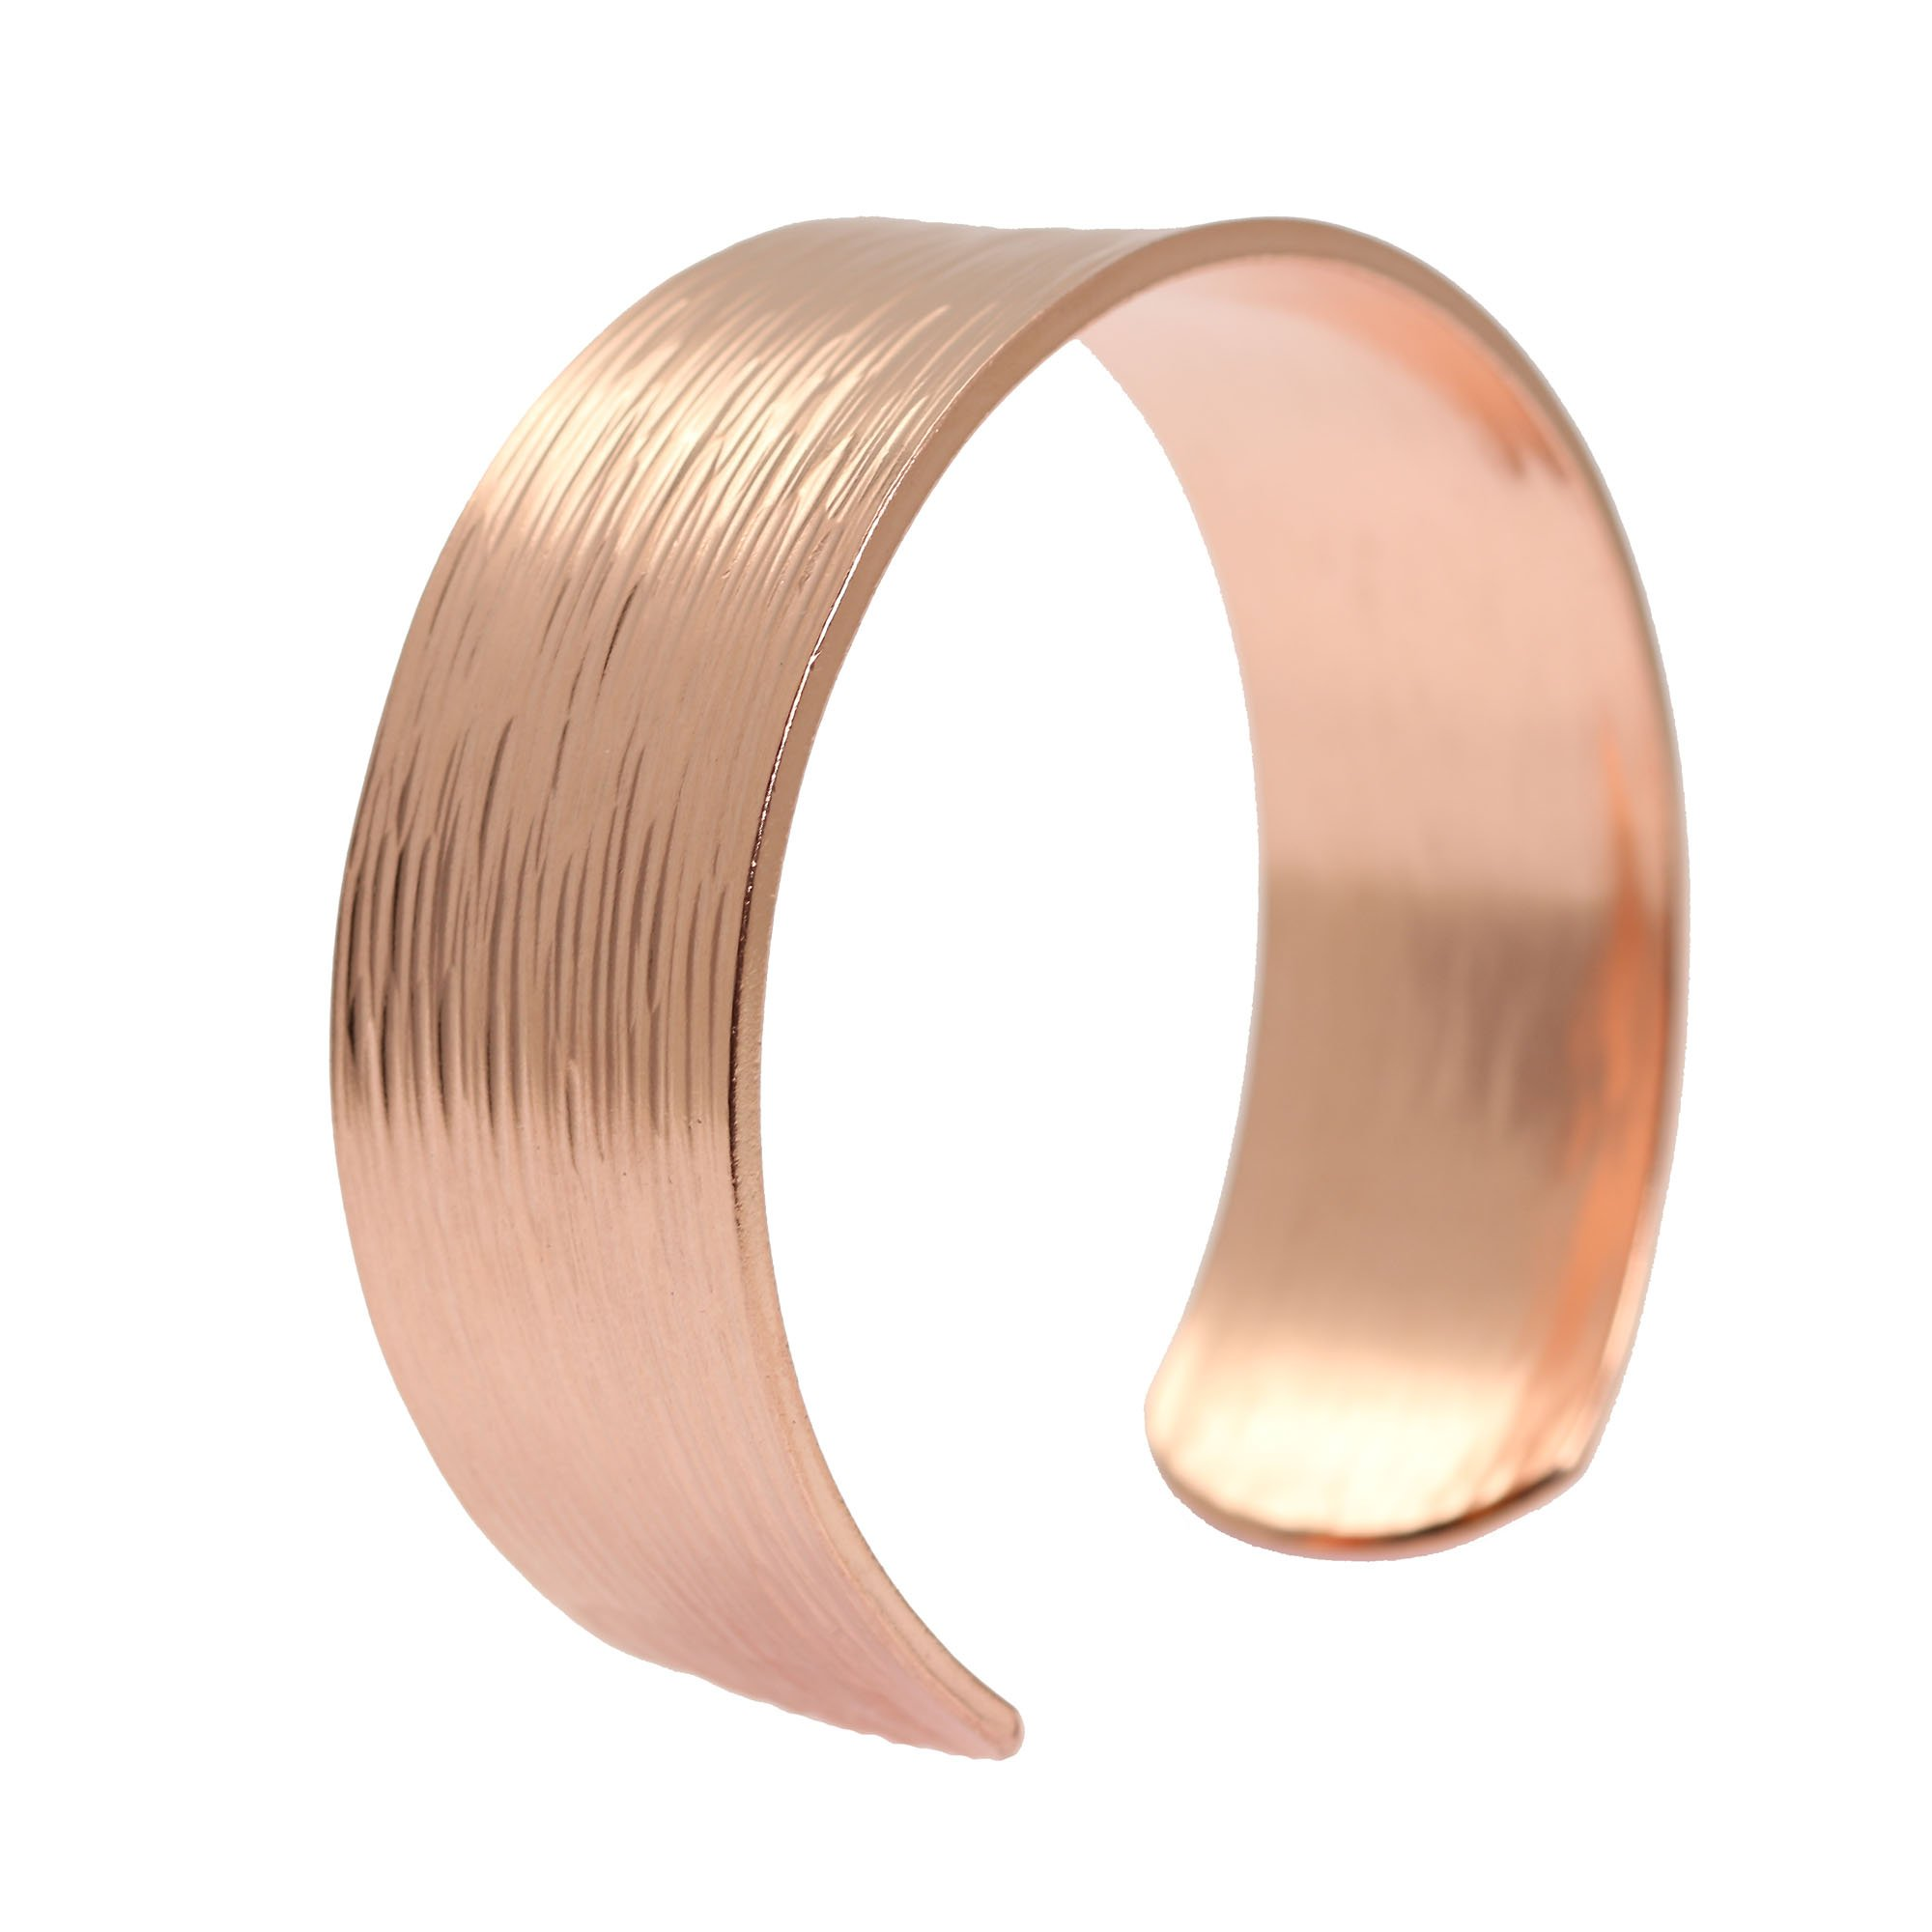 John S Brana Designer Jewelry Chased Copper Cuff Bracelet - 100% Solid Copper - 7 Year by John S Brana Designer Jewelry